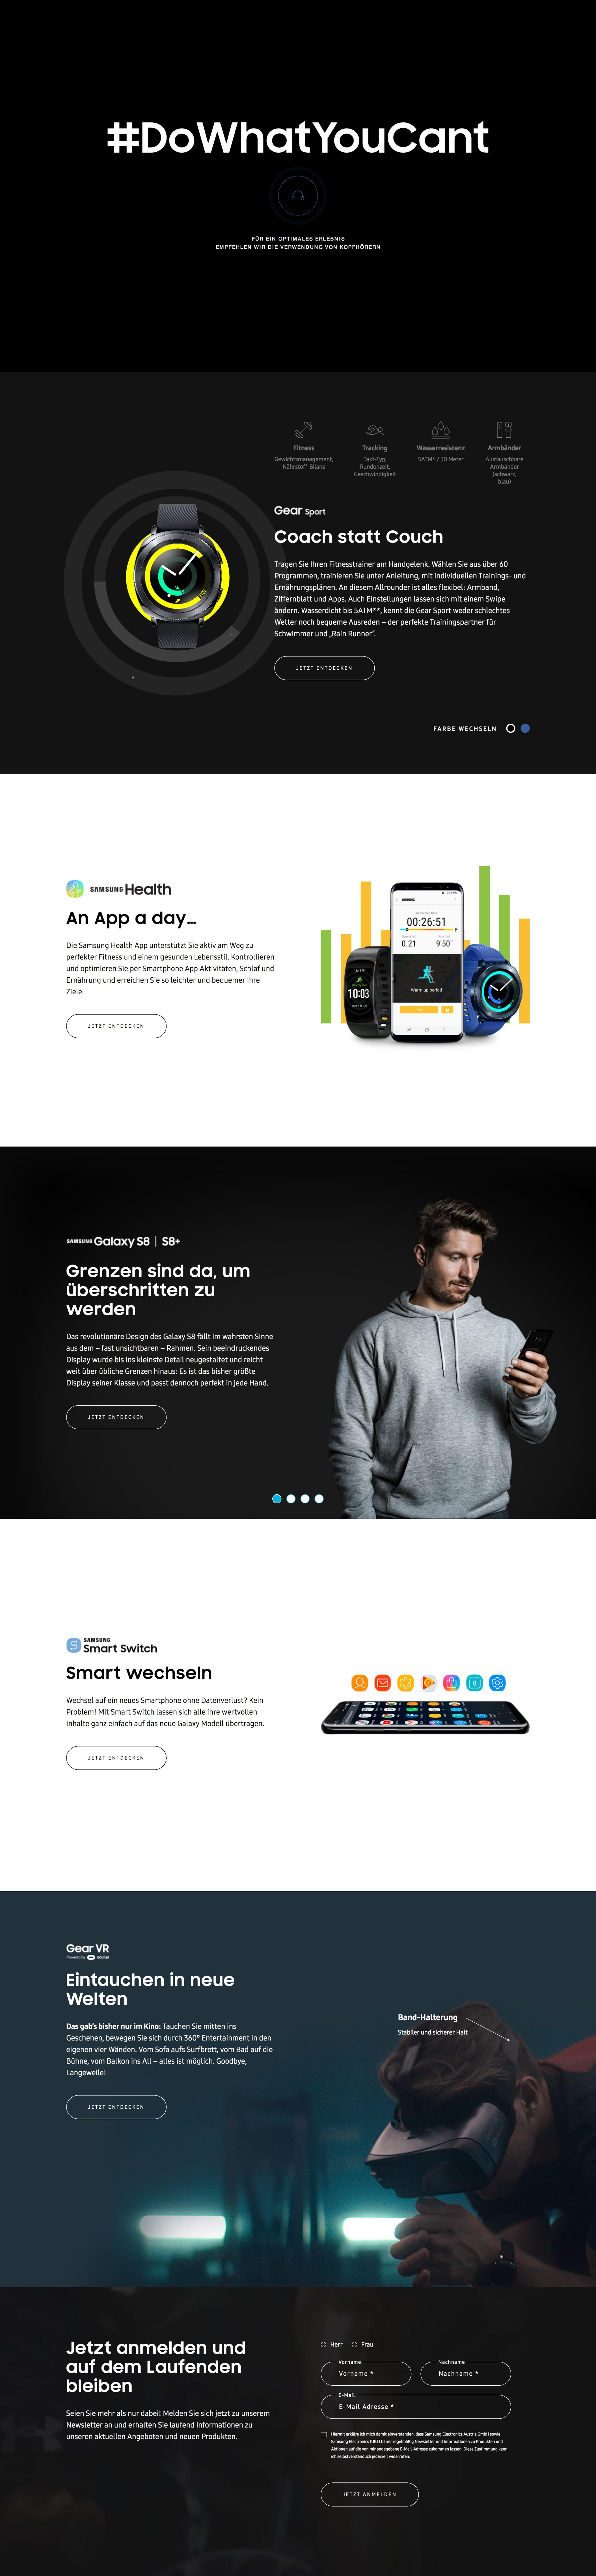 #DoWhatYouCant Website Screenshot